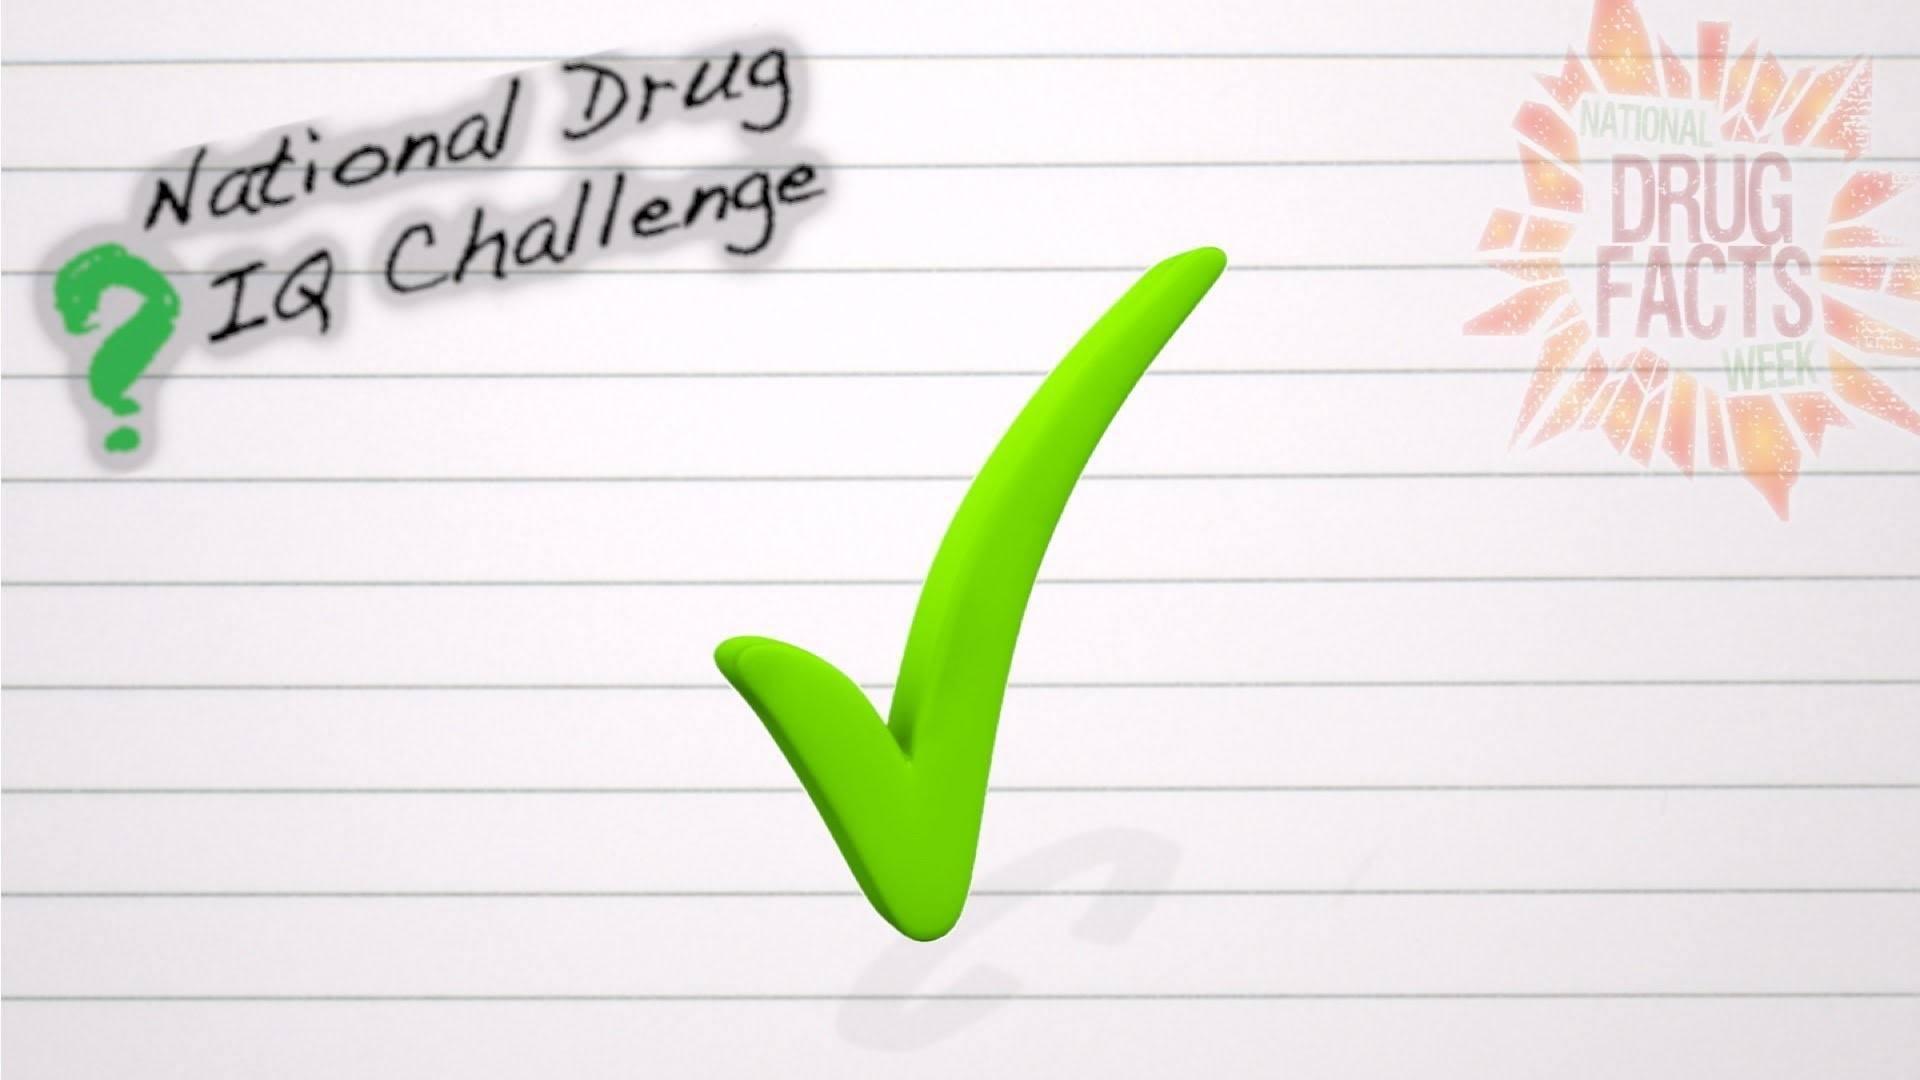 nfl combine drug iq test 2016